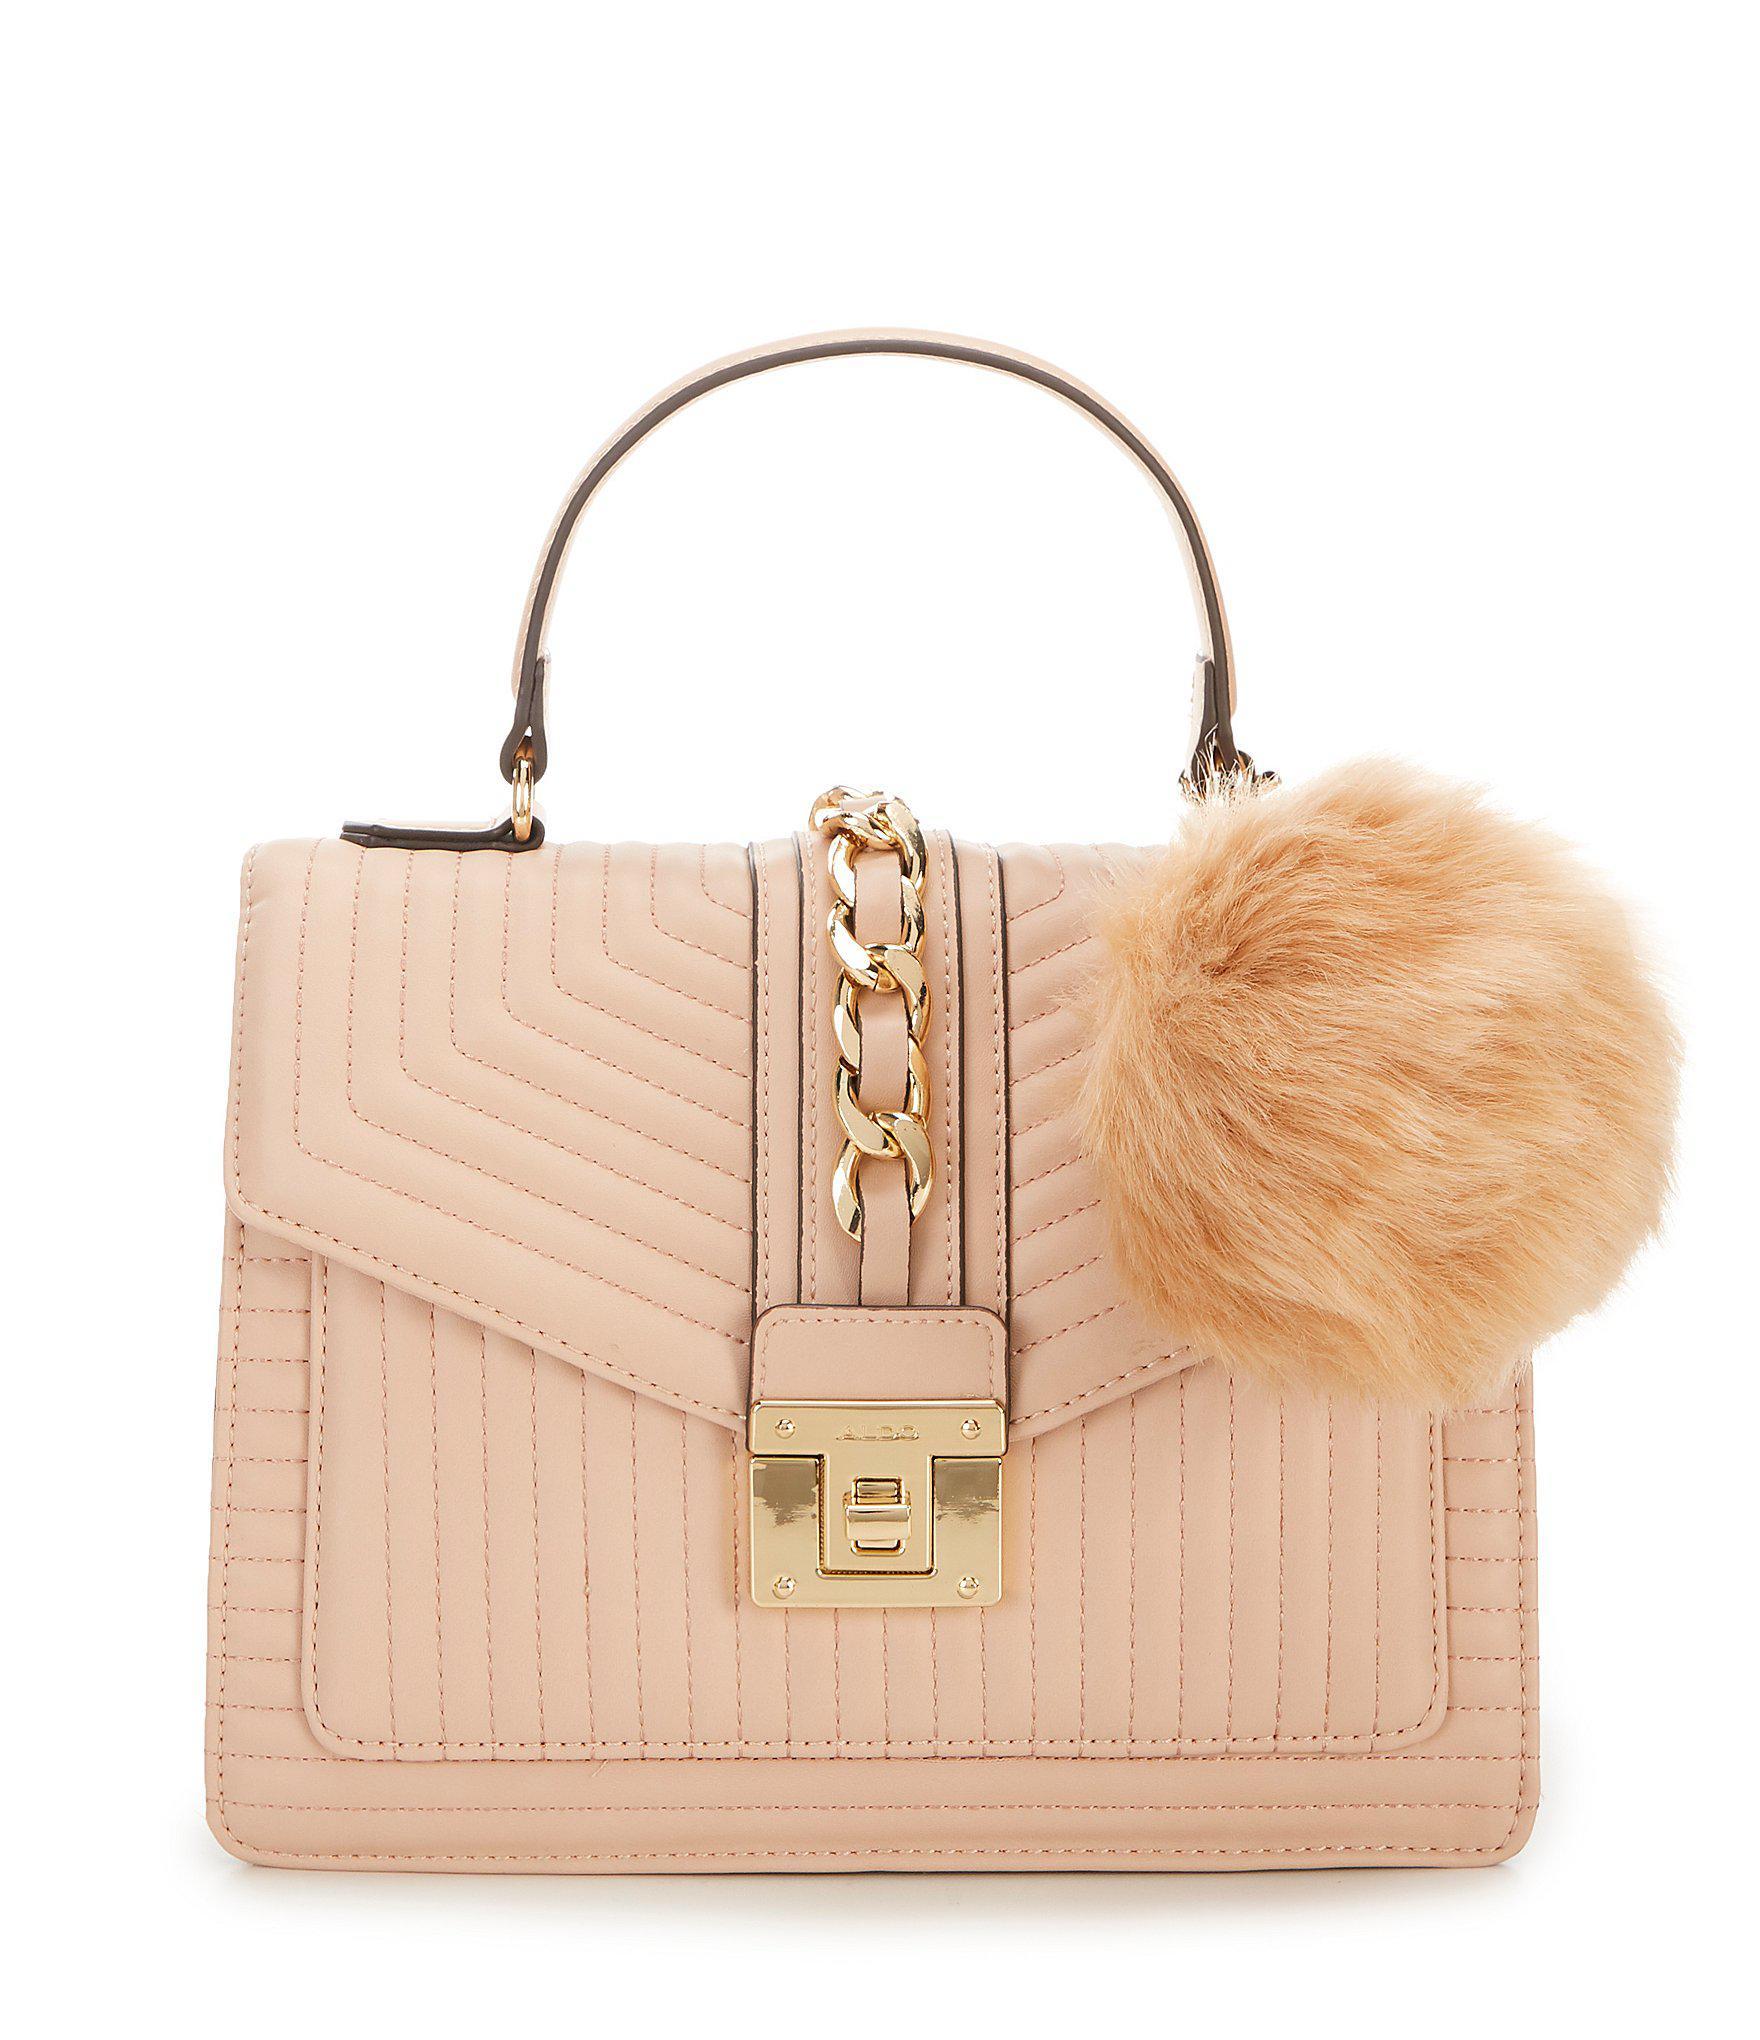 e1b764aaa41 ALDO Jerilini Top Handle Handbag in Natural - Lyst